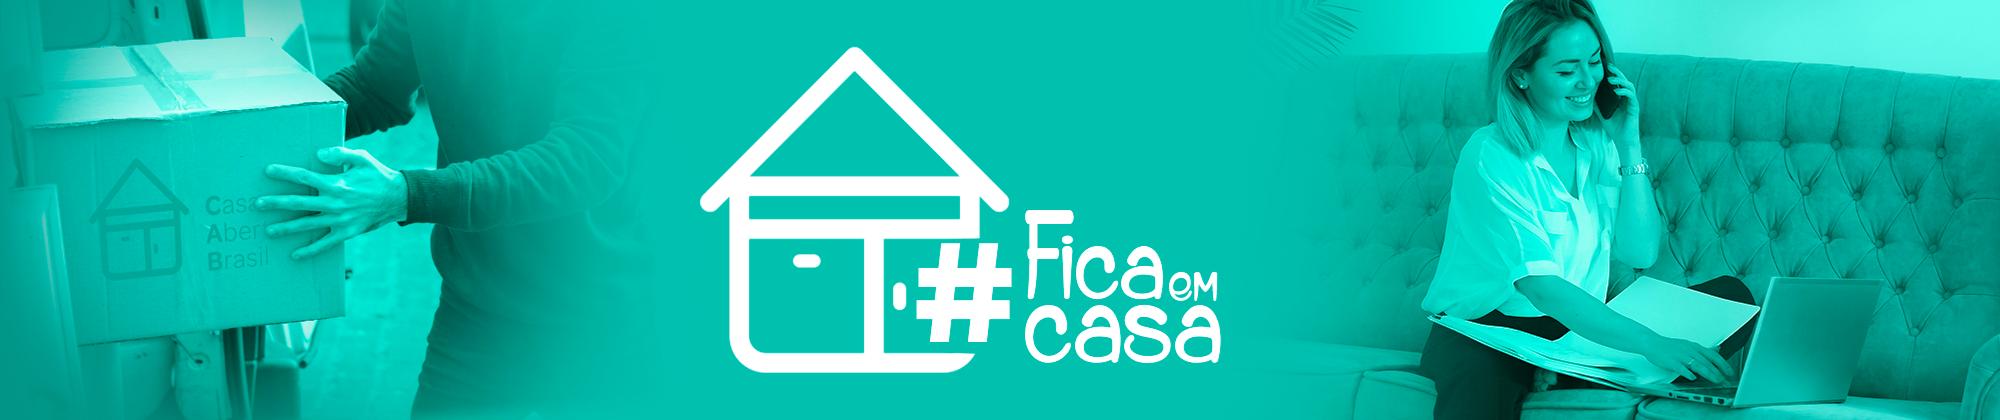 Casa Aberta Brasil #FiqueemCasa